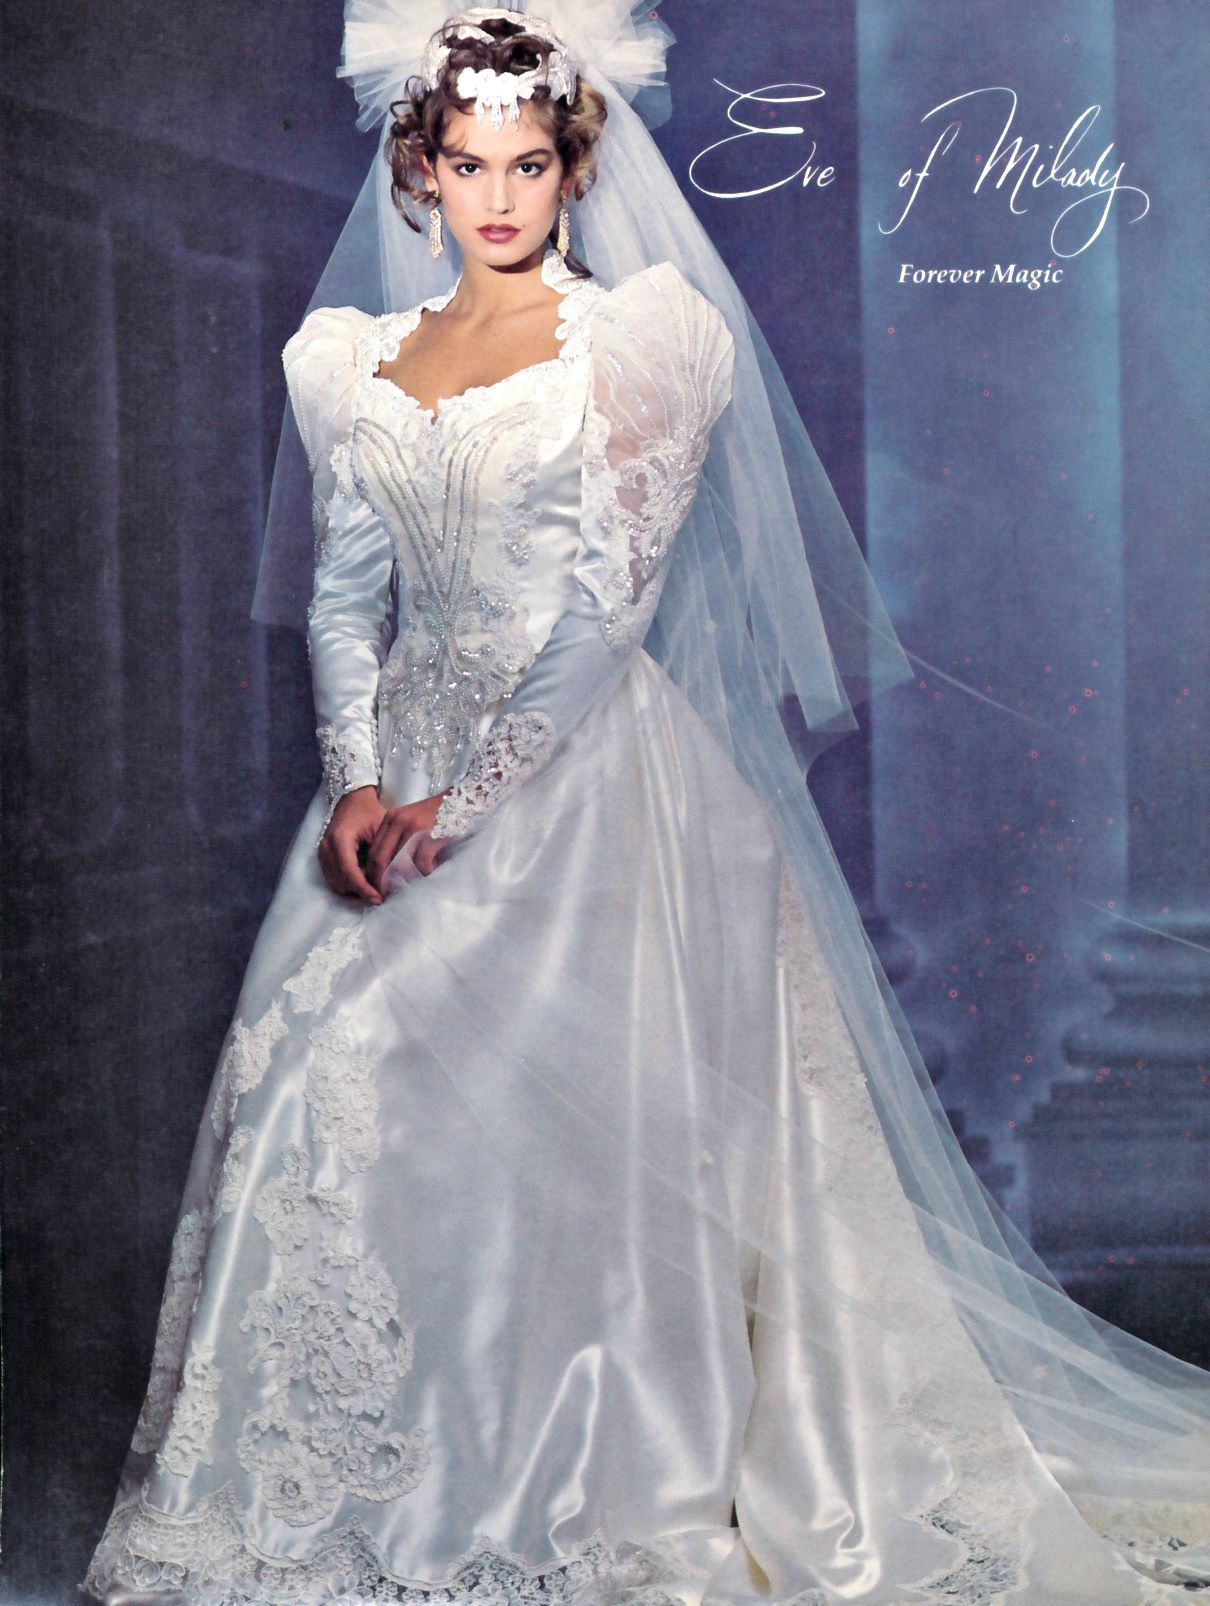 Cindy Crawford Wedding Dress Gorgeous Wedding Dress Beautiful